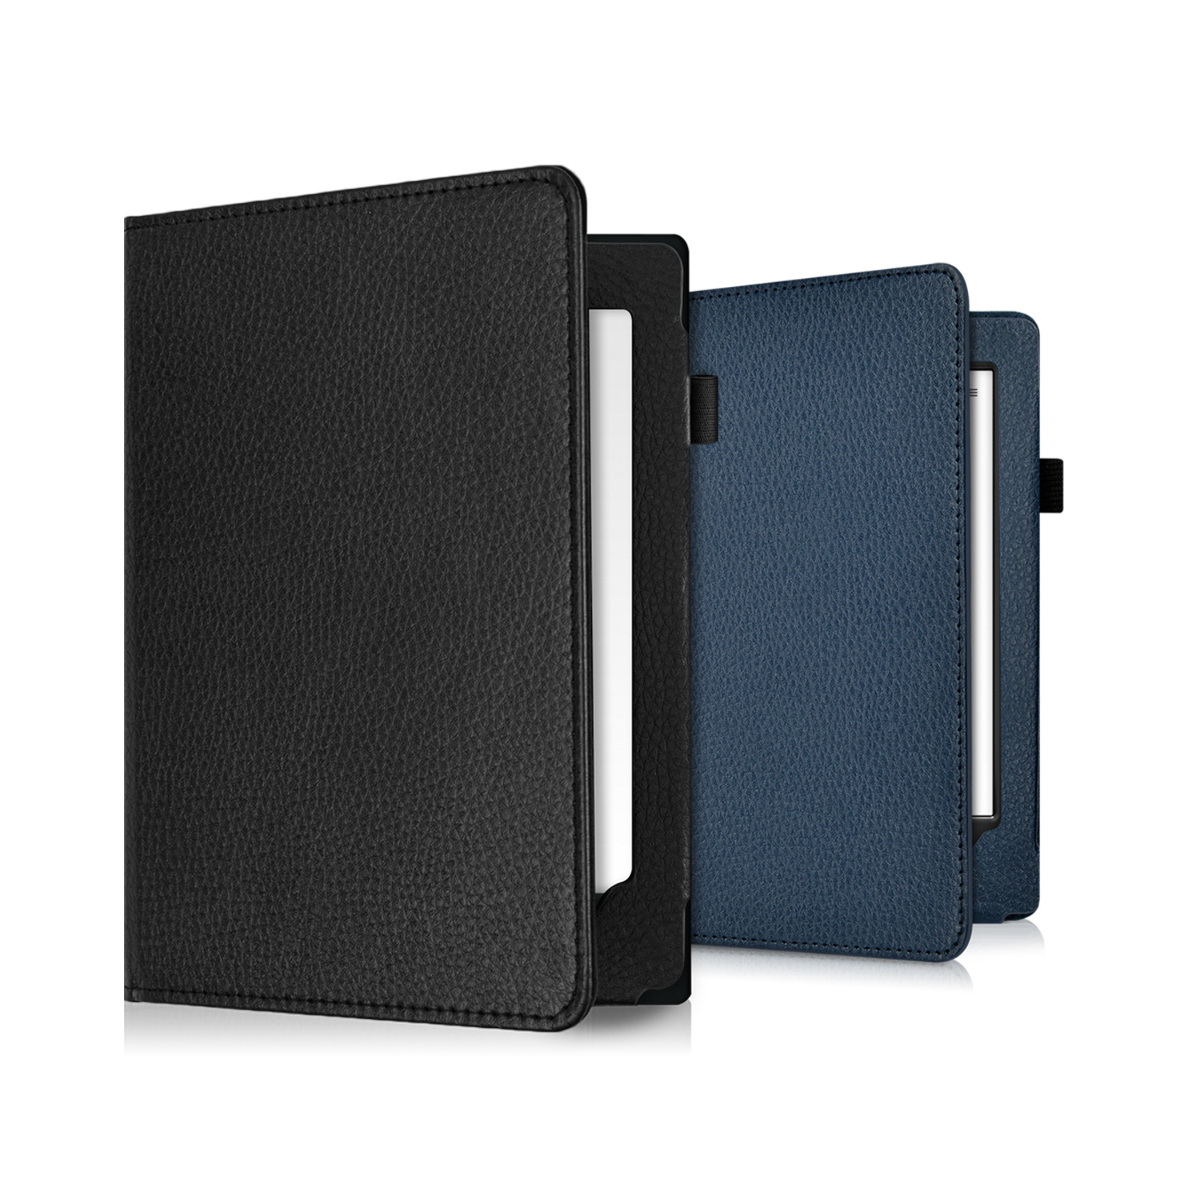 Kwmobile book style case for kobo aura h2o edition 1 cover for Housse kobo aura h2o edition 2